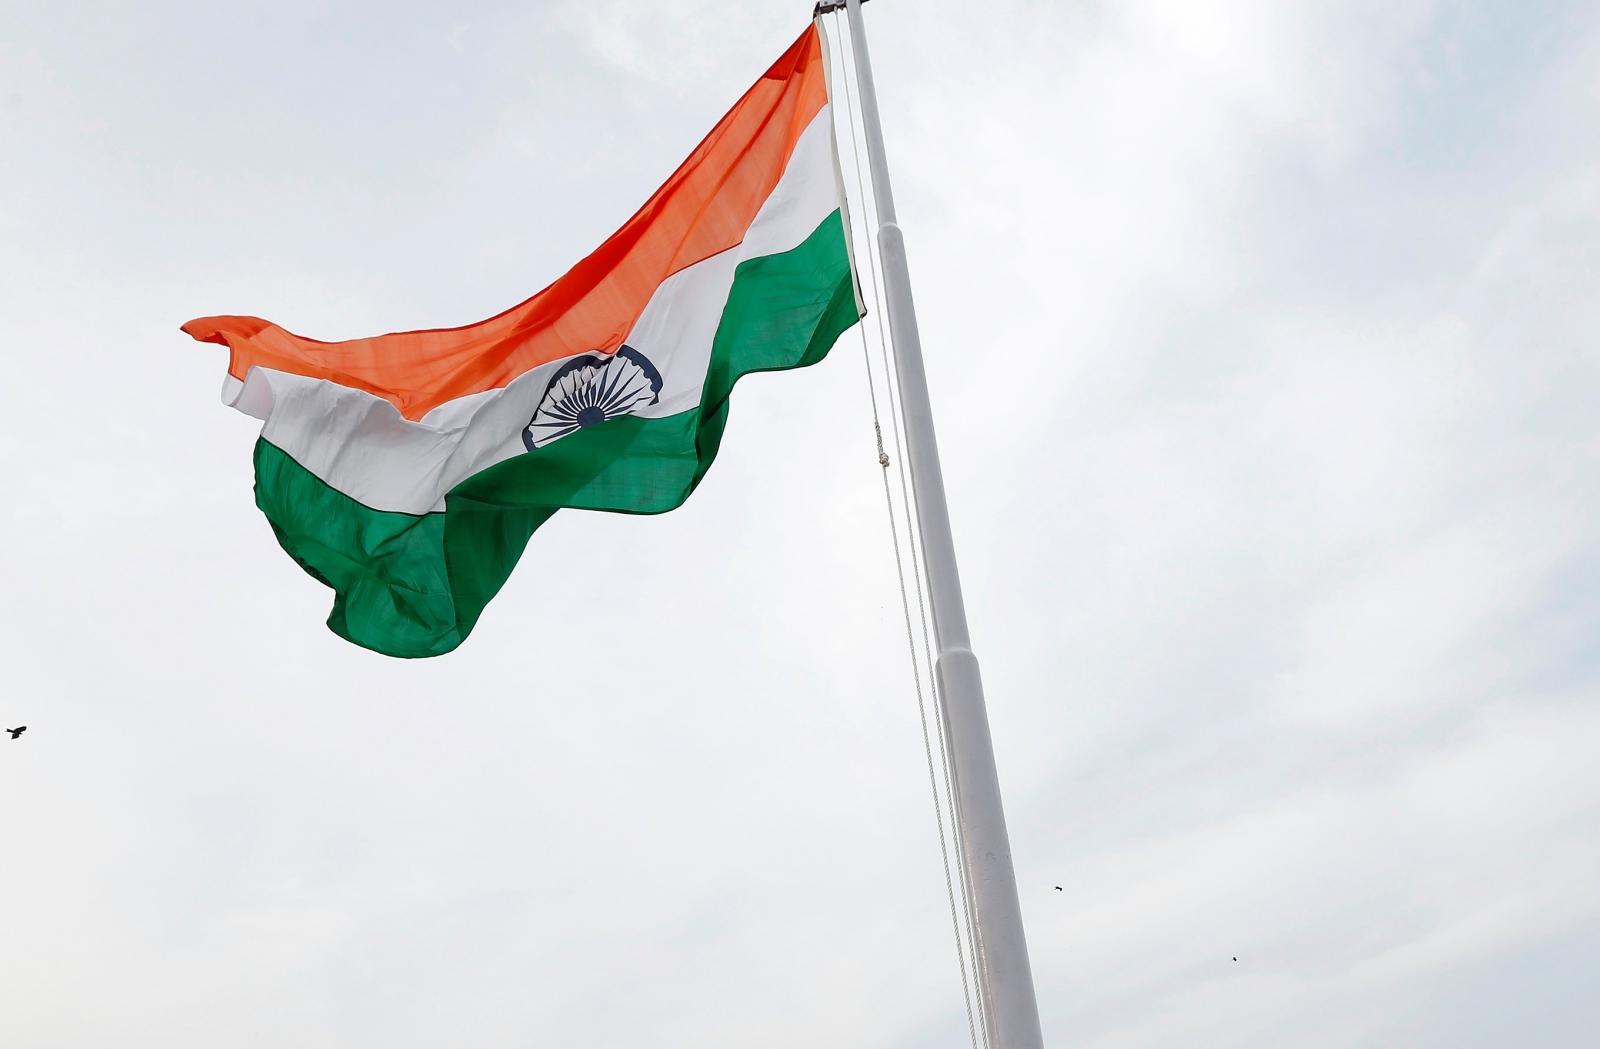 India tricolour flag